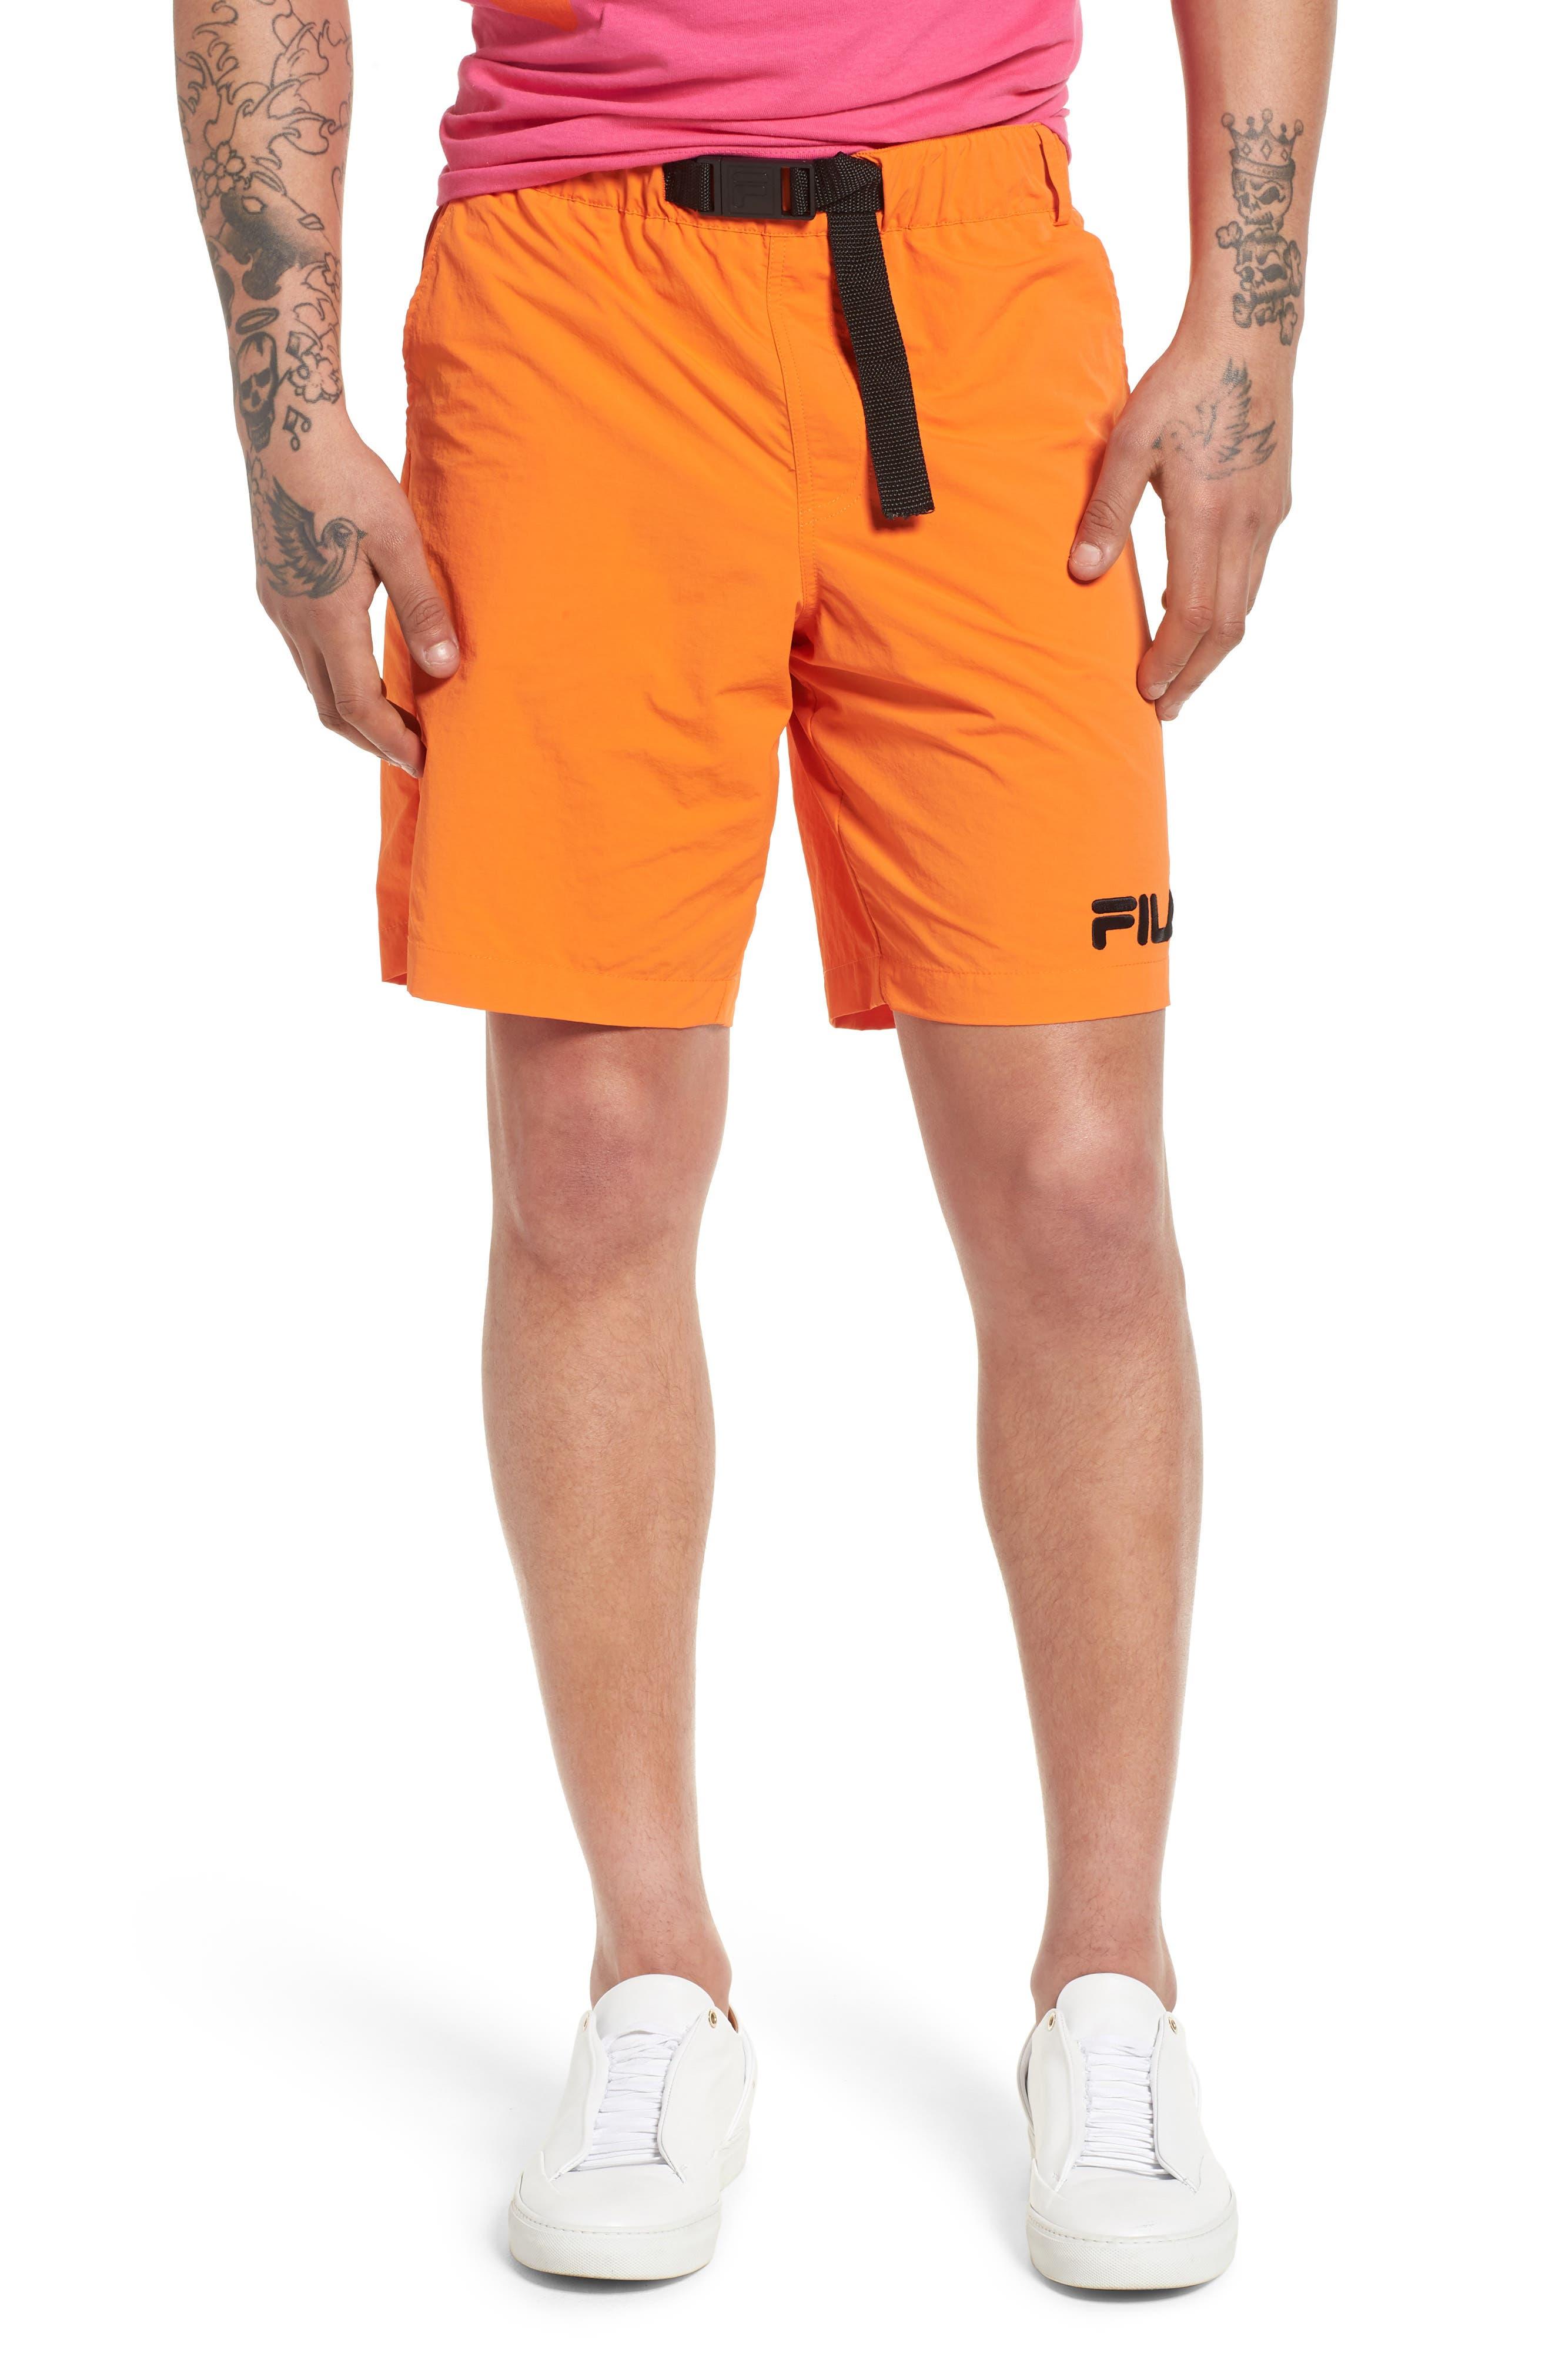 Mondy Shorts,                             Main thumbnail 5, color,